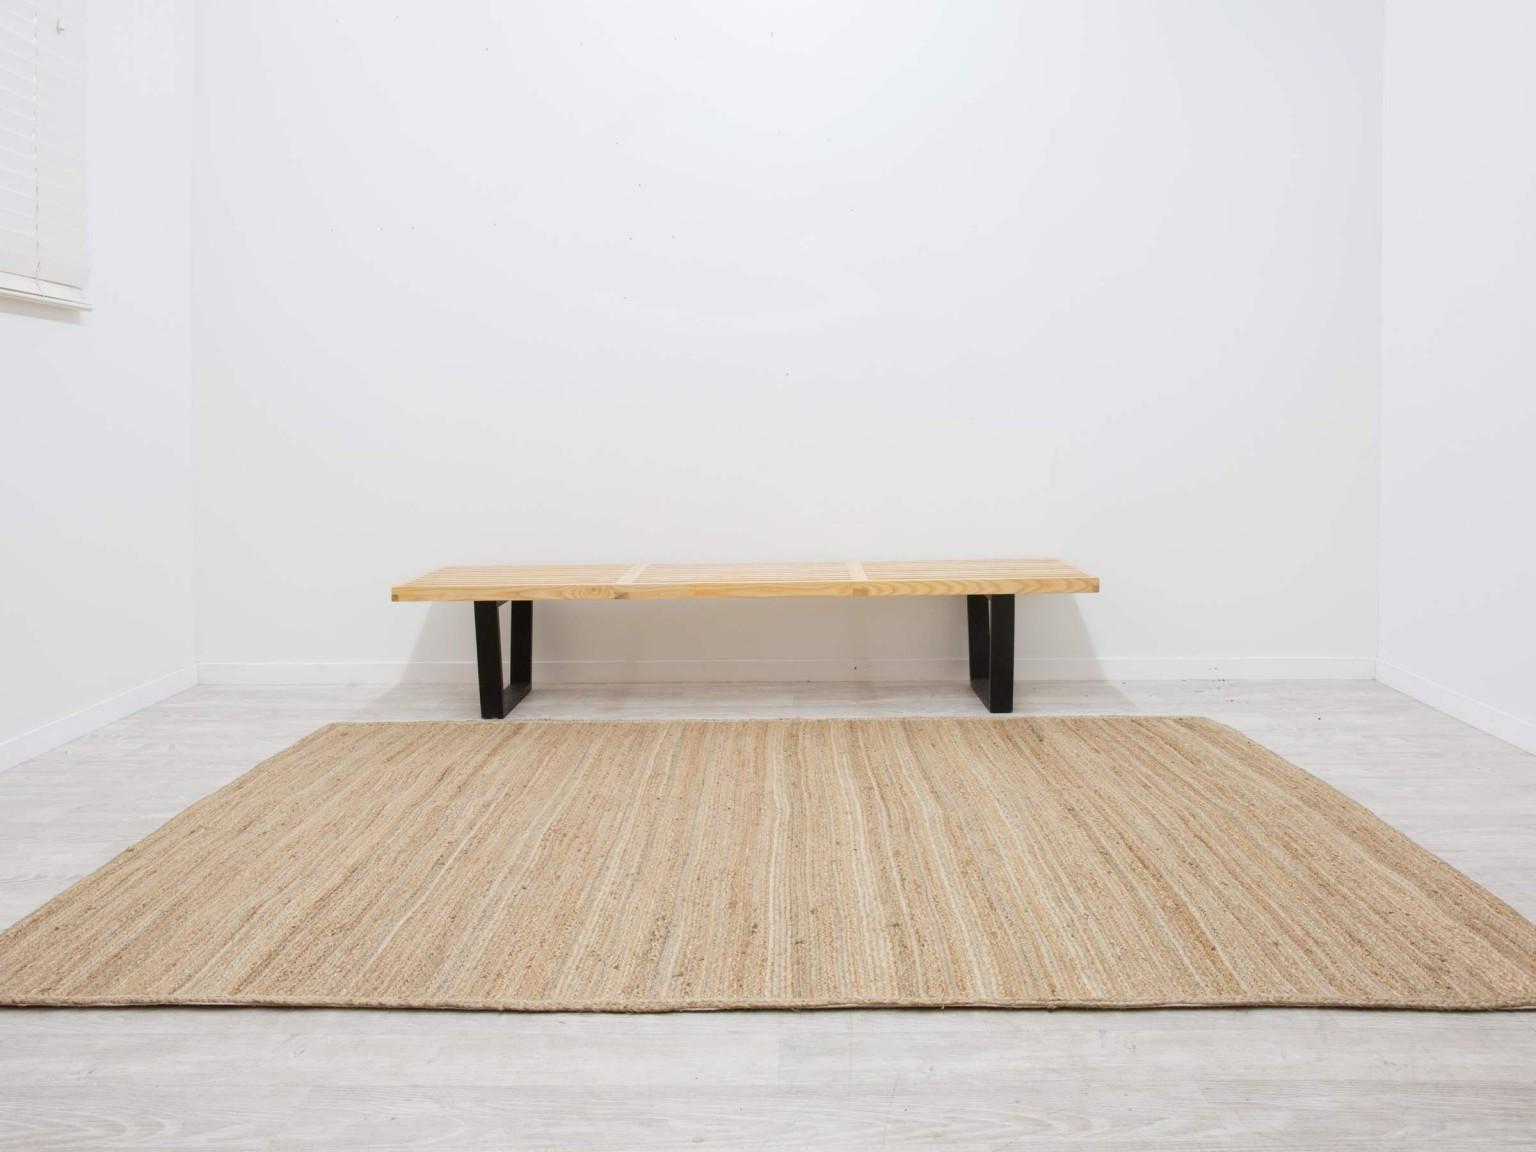 27 Elegant Hardwood Flooring Brisbane Prices 2021 free download hardwood flooring brisbane prices of mocka ruby rug living room decor shop now with mocka ruby rug with nelson platform bench